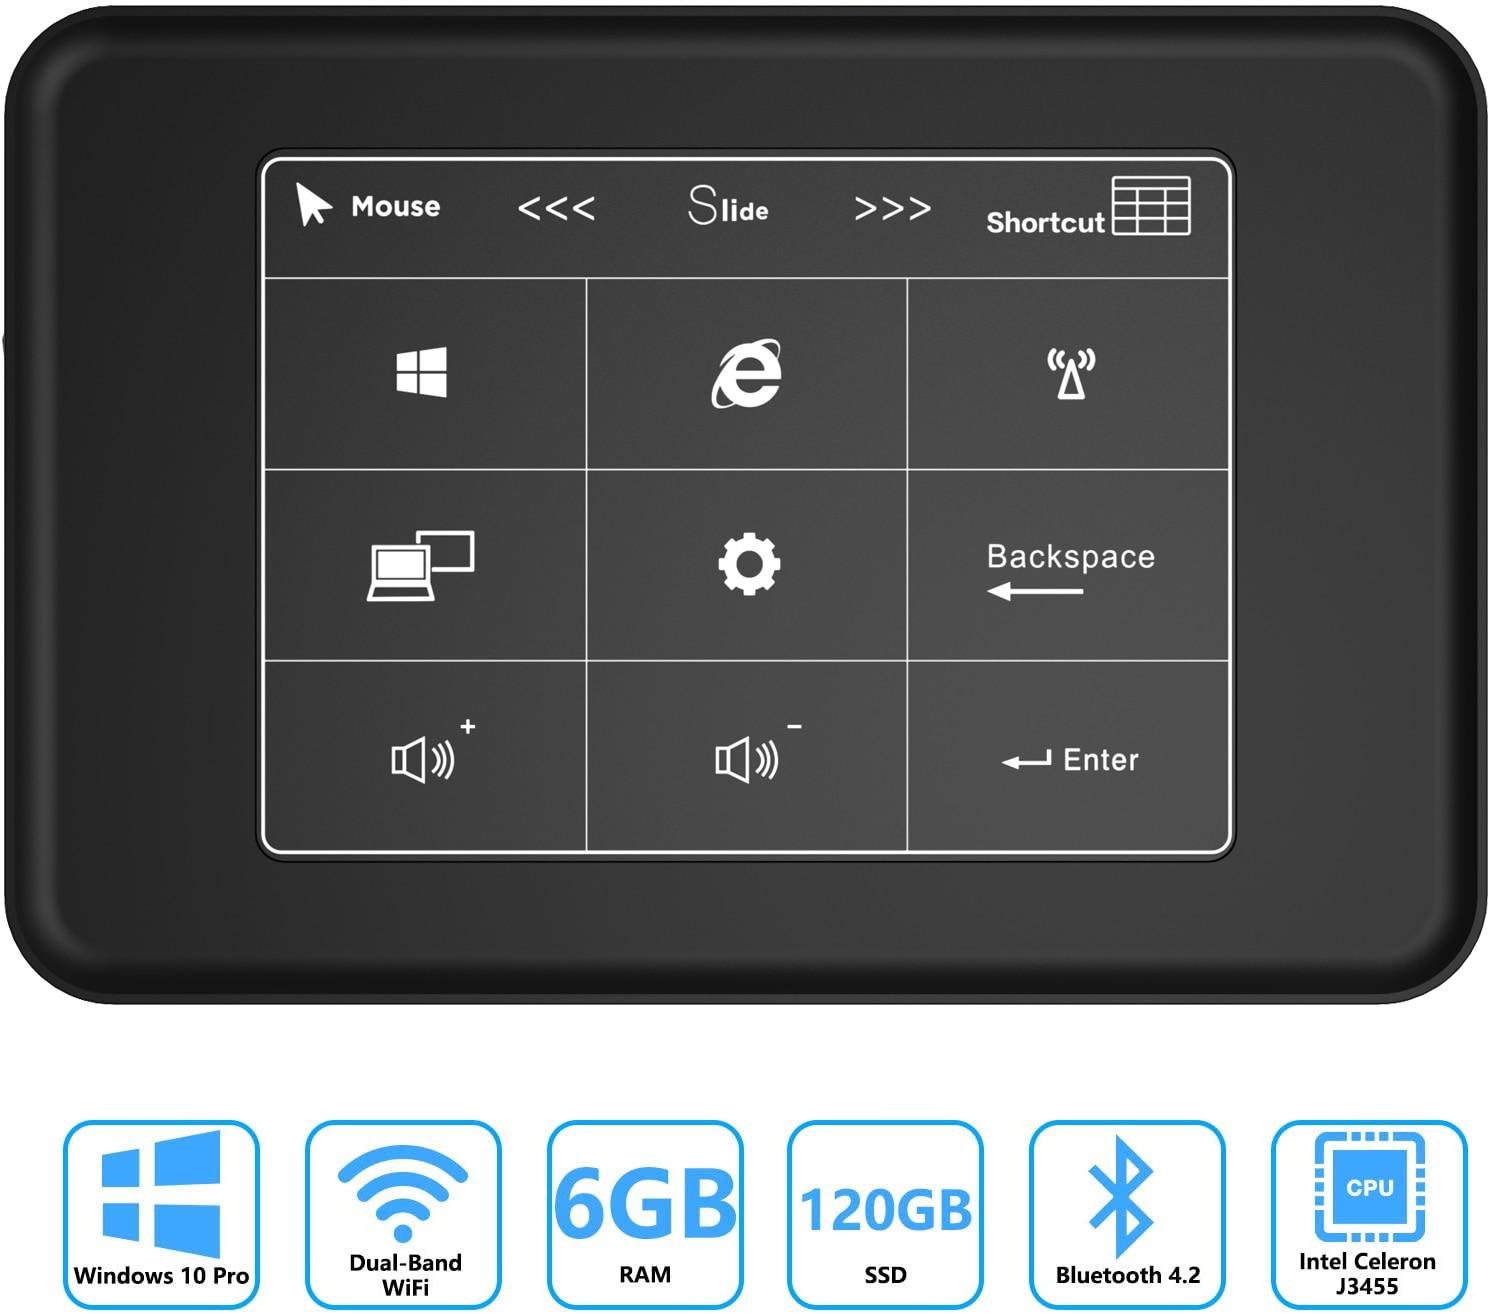 Дешевый мини ПК Windows 10 Pro 6 Гб Ram 512 ГБ 1 ТБ SATA SSD Celeron J3455 4K HD Graphics мини-компьютер HDMI Gigabit Dual Band